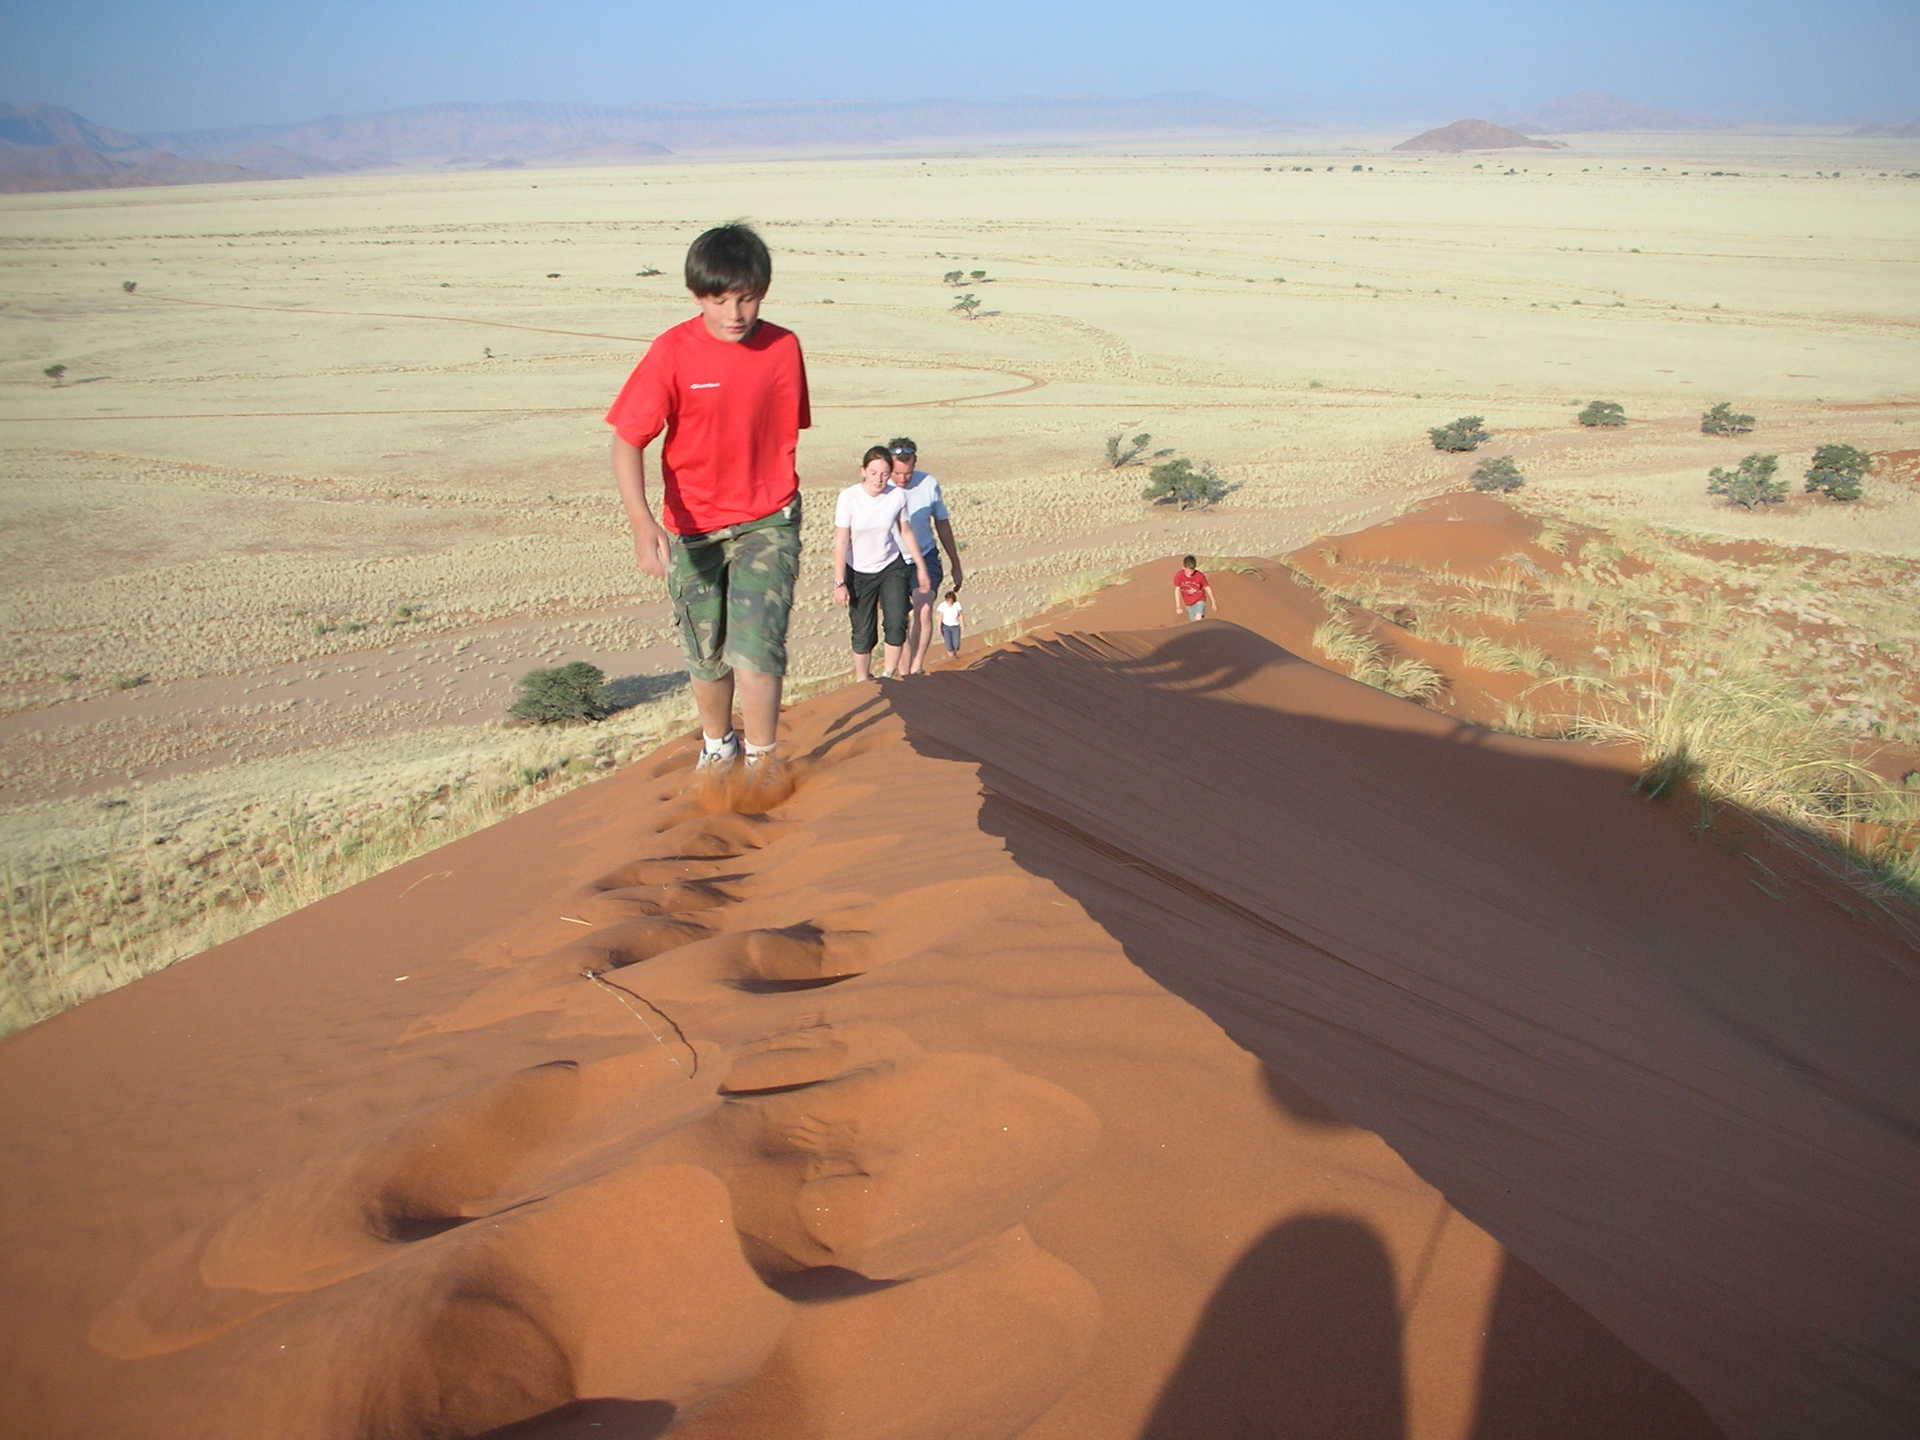 Namibie, dune, Sossuleiv